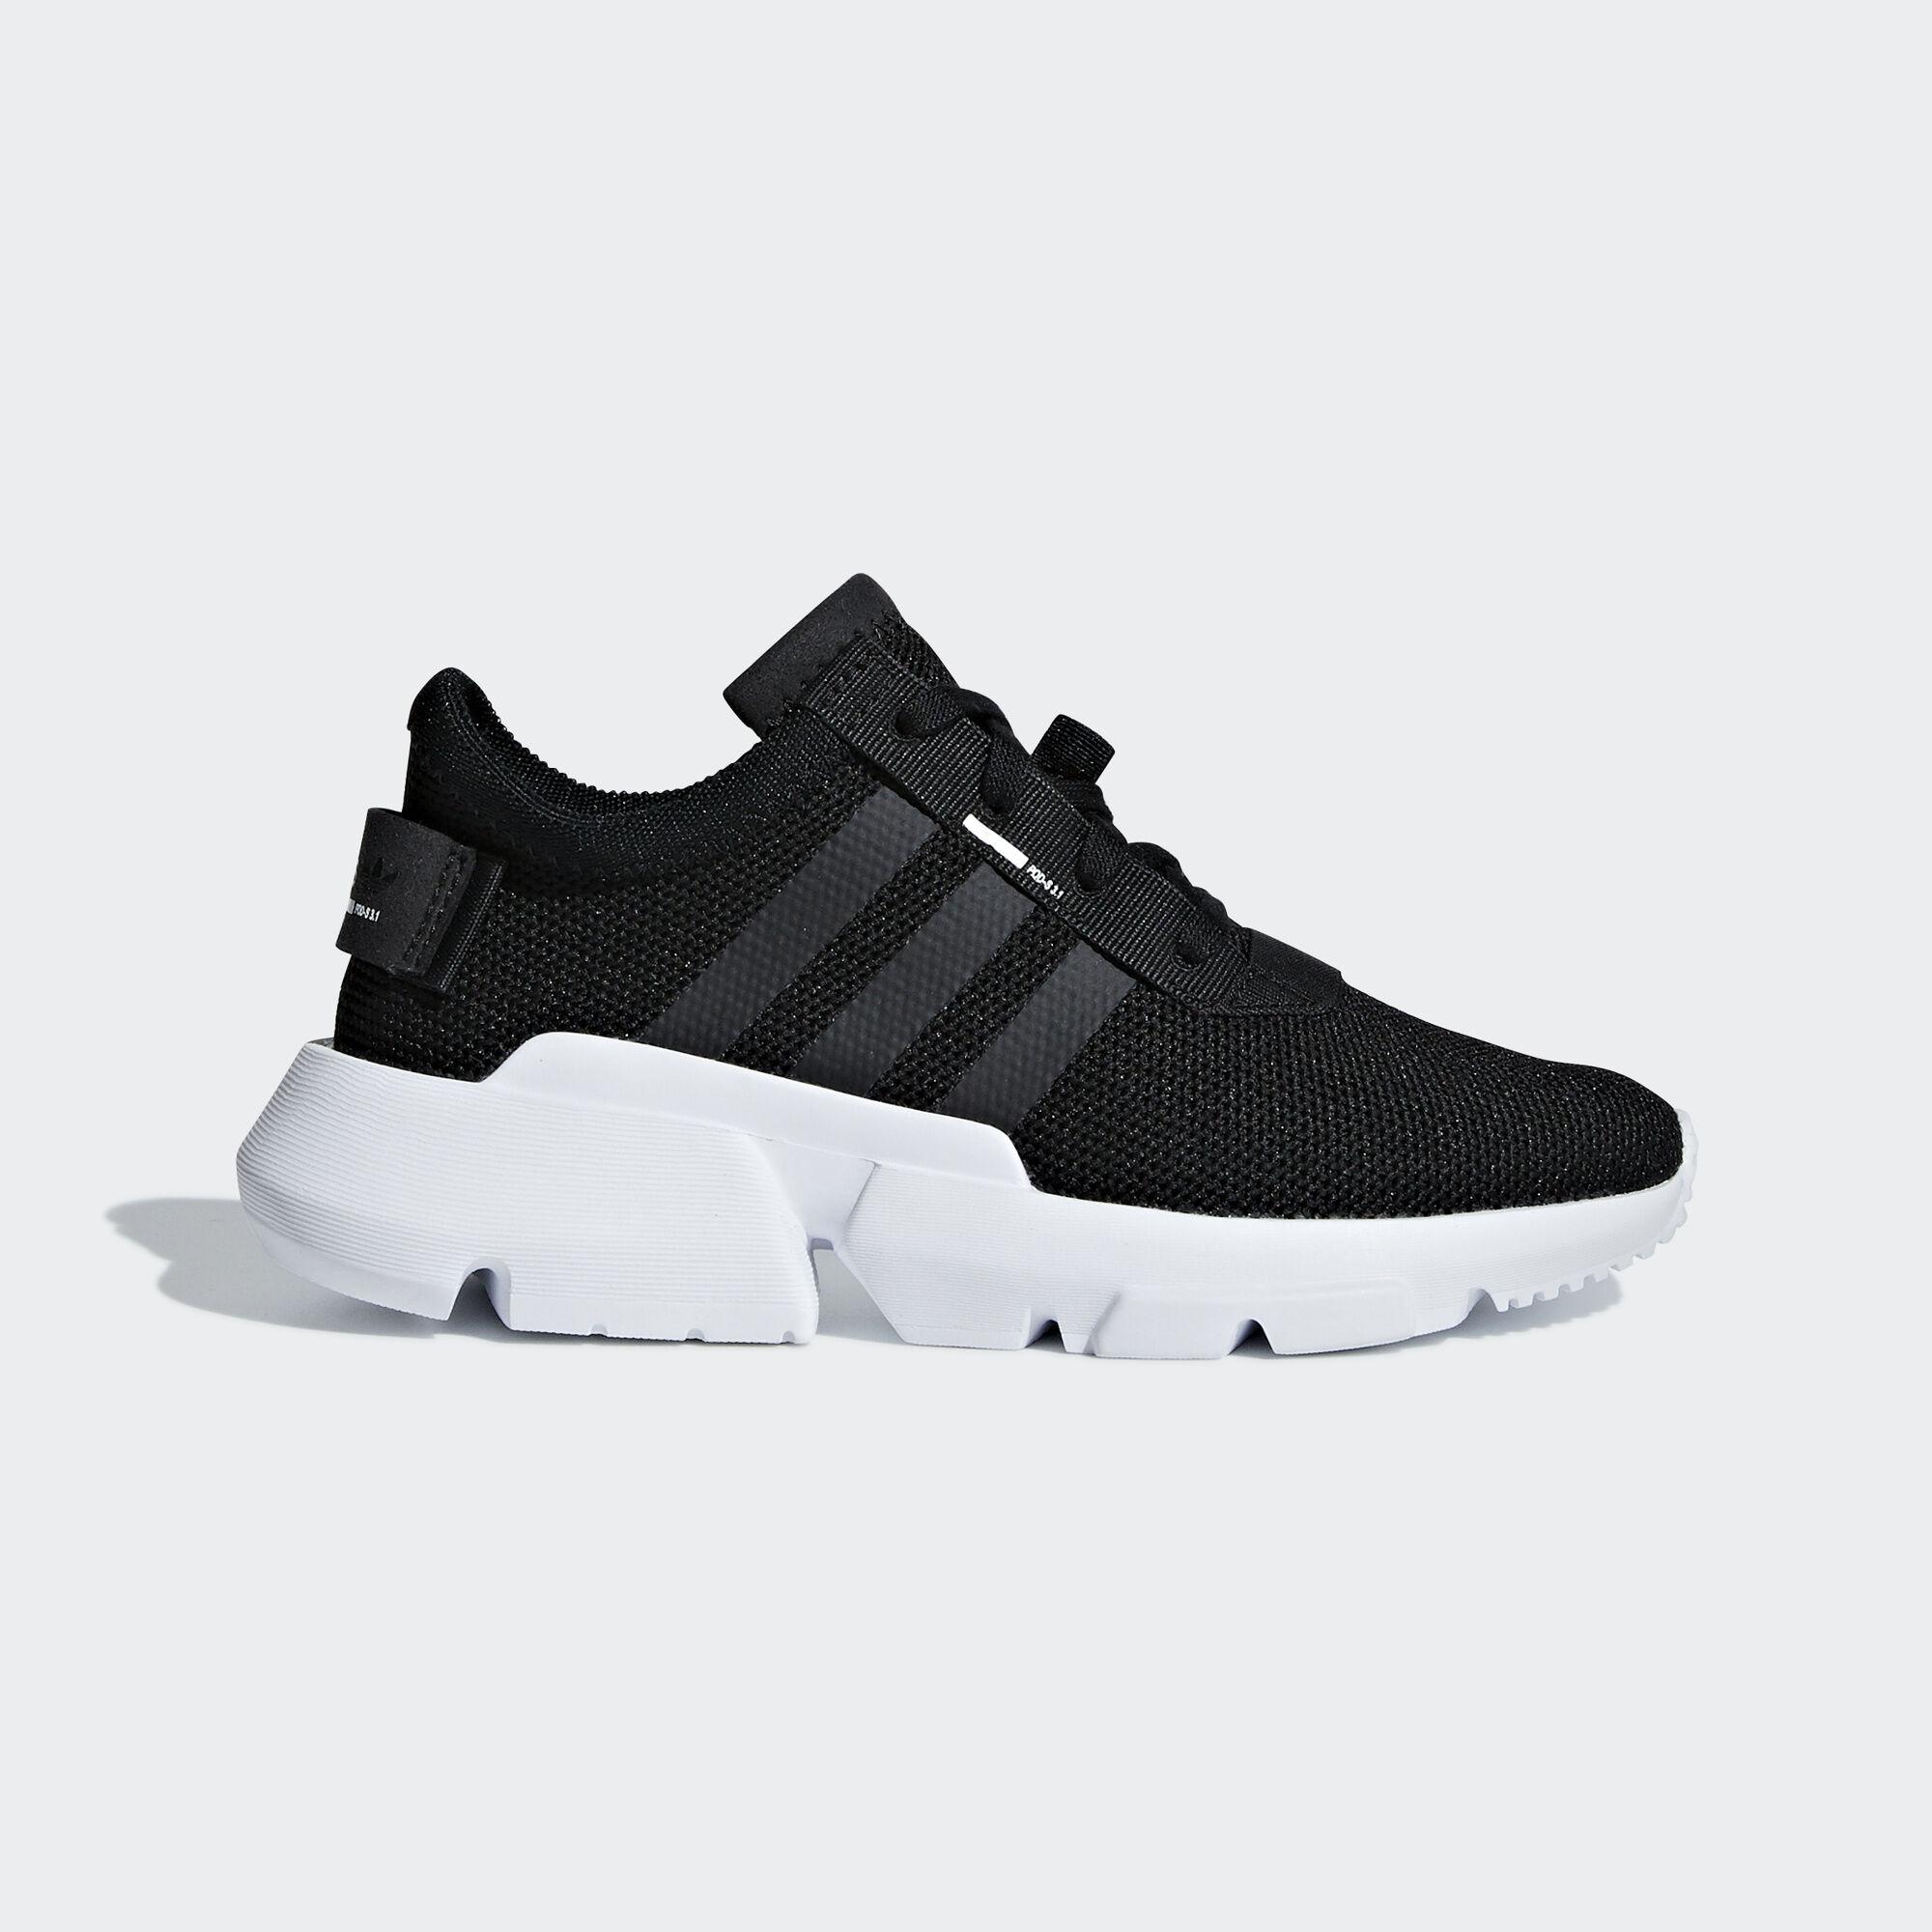 41b7285cca3f adidas - POD-S3.1 Shoes Core Black   Core Black   Ftwr White. Kids Originals